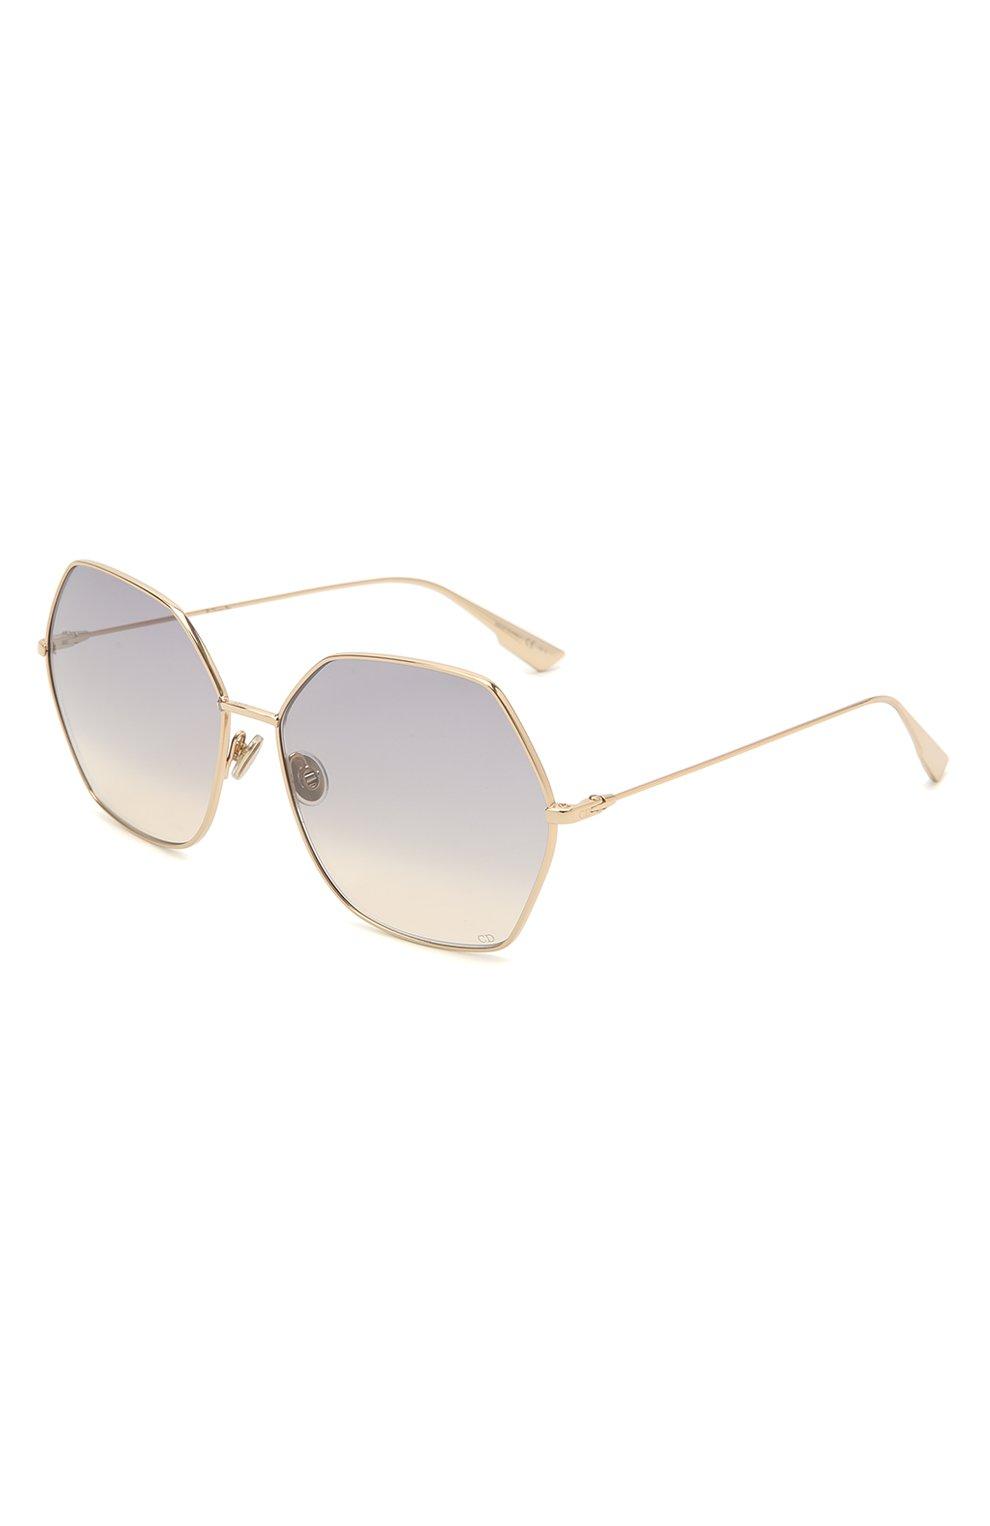 Женские солнцезащитные очки DIOR сиреневого цвета, арт. DI0RSTELLAIRE8 J5G FF | Фото 1